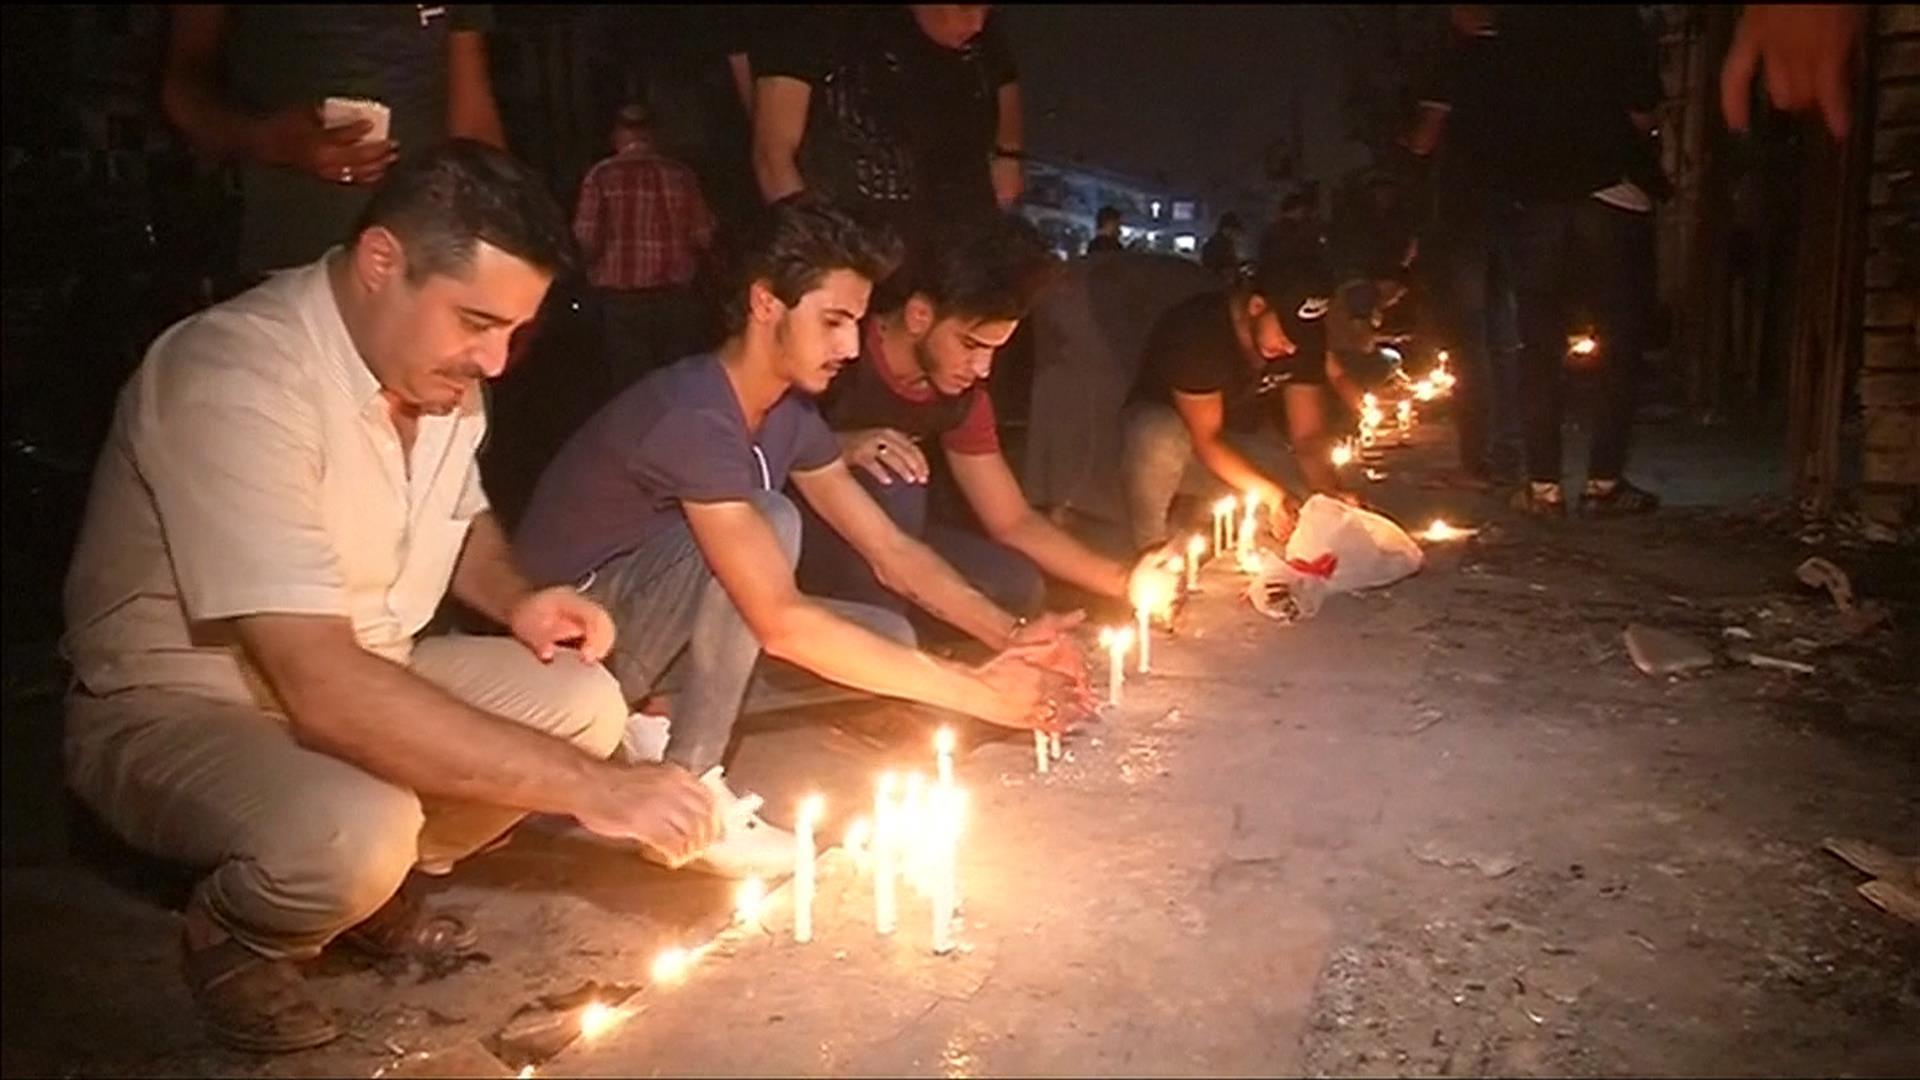 Baghdad Bomb Toll Hits 200; Iraqis Take Out Anger on PM Al-Abadi